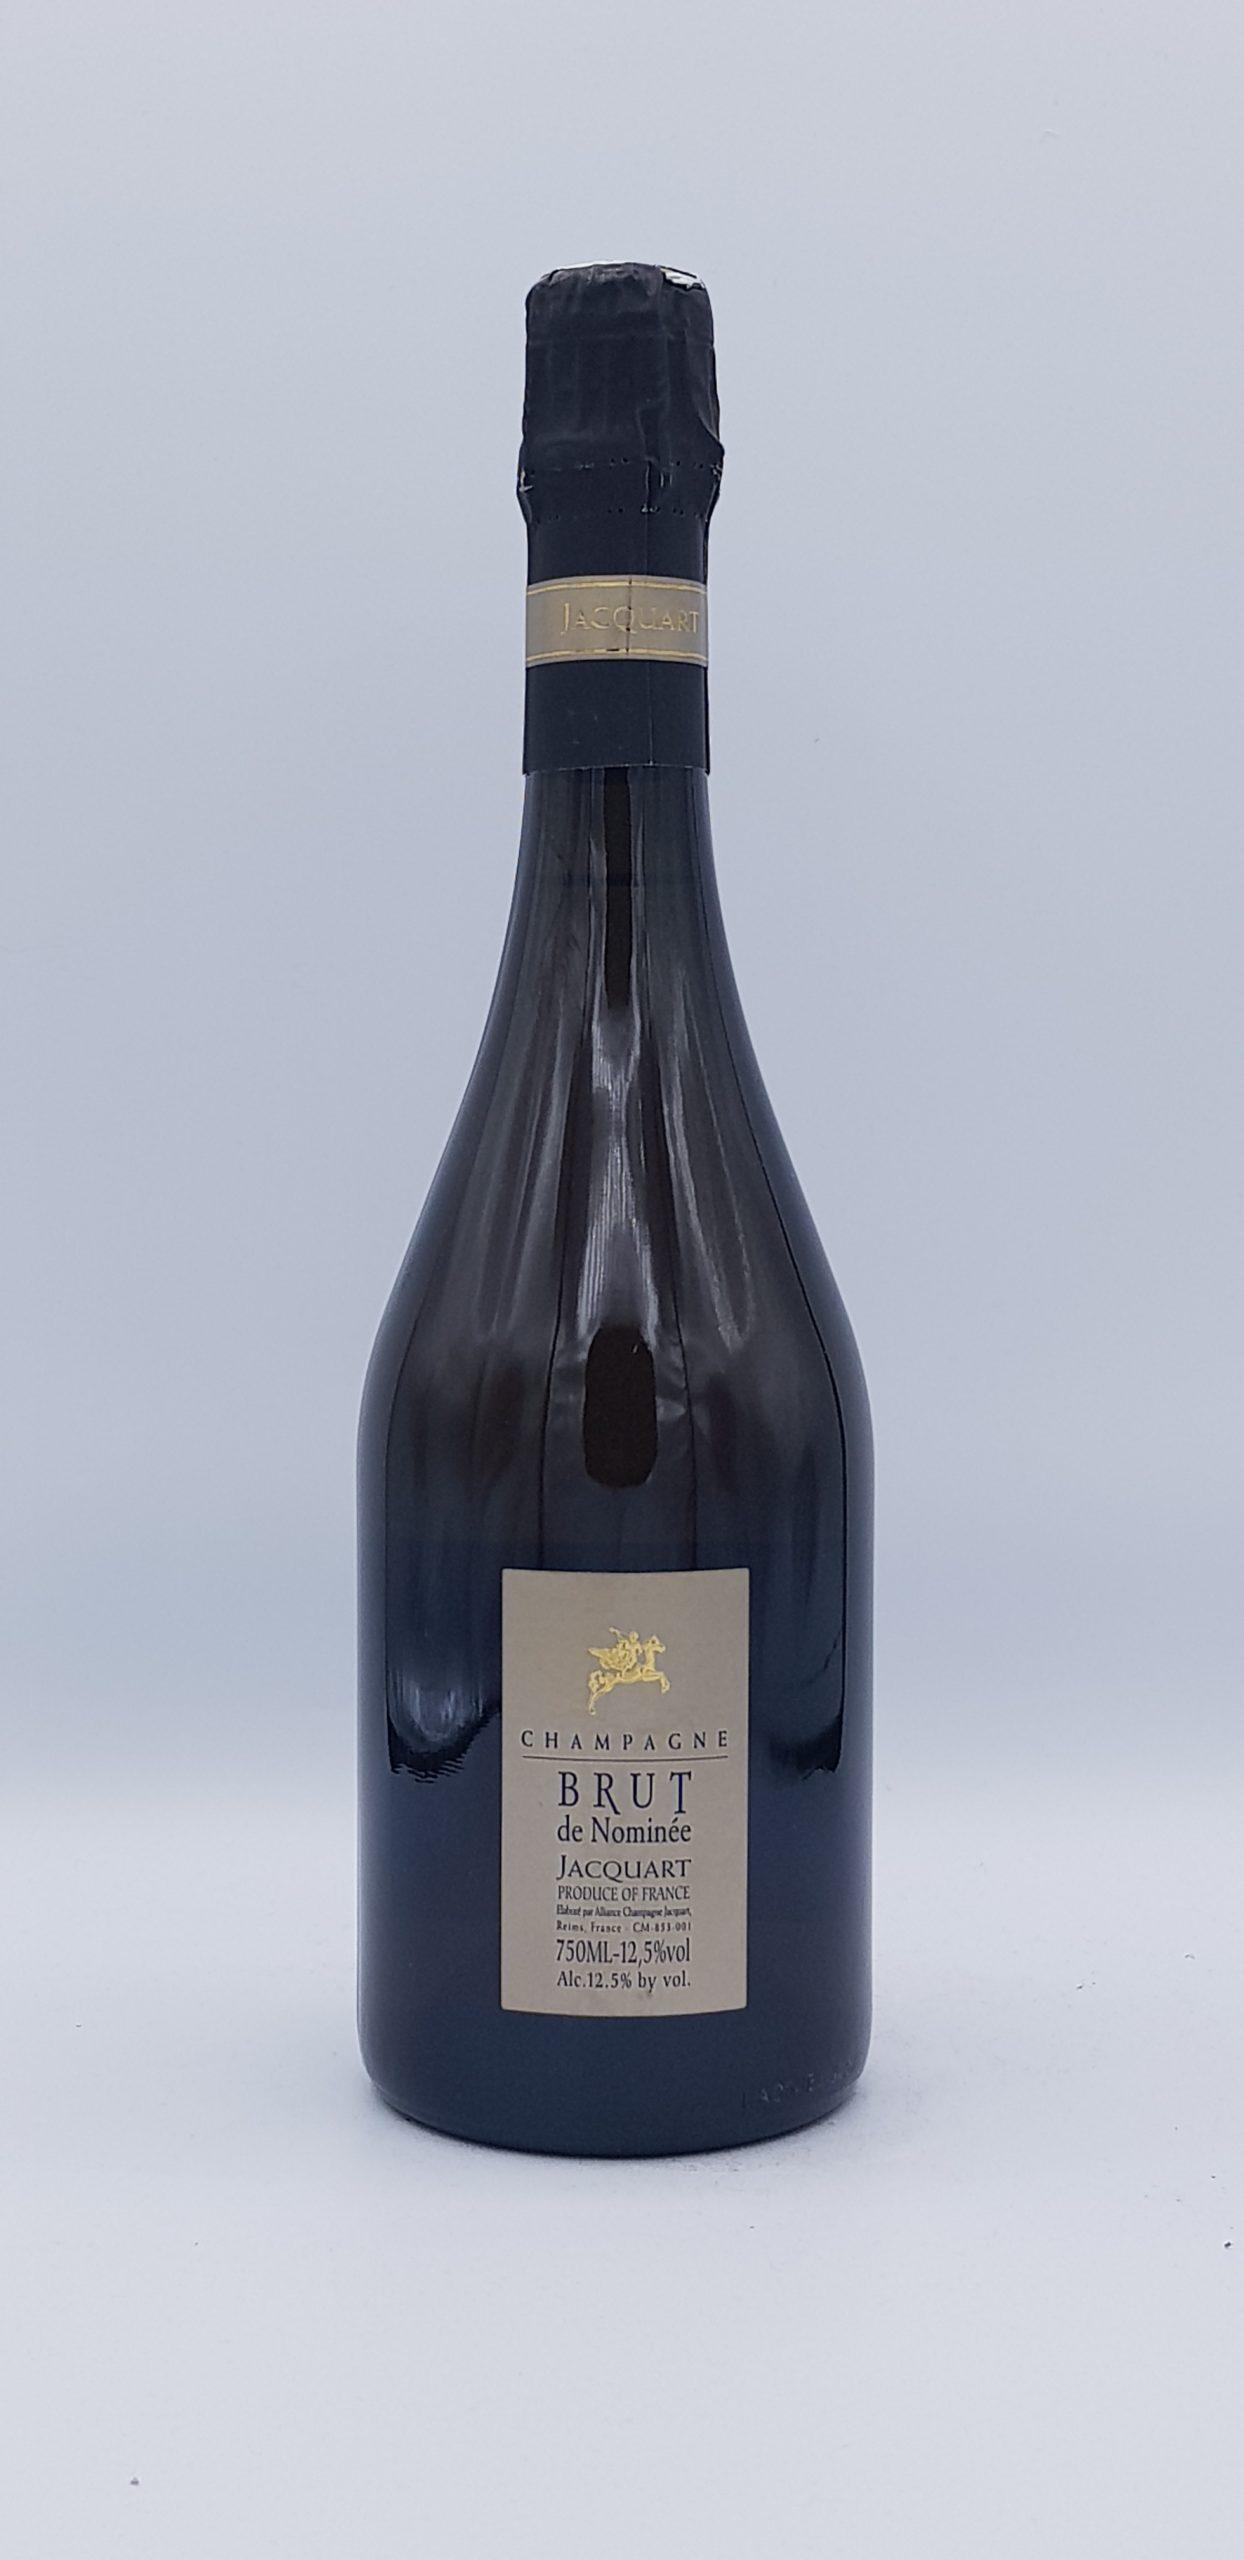 Champagne Jacquart Brut Nomine